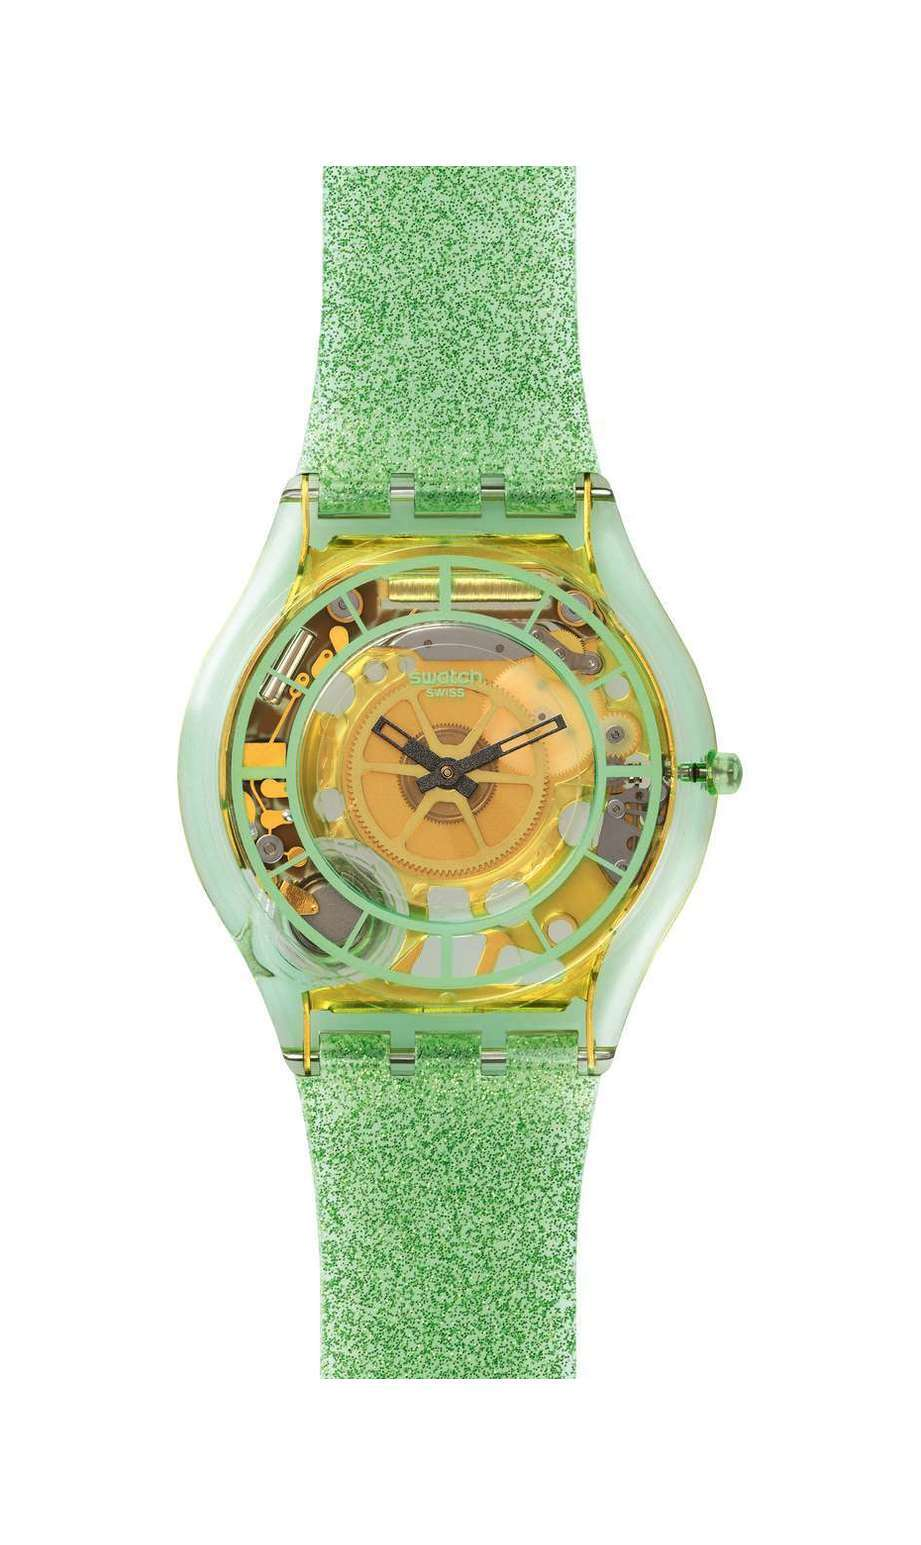 Swatch - VERDOR - 1